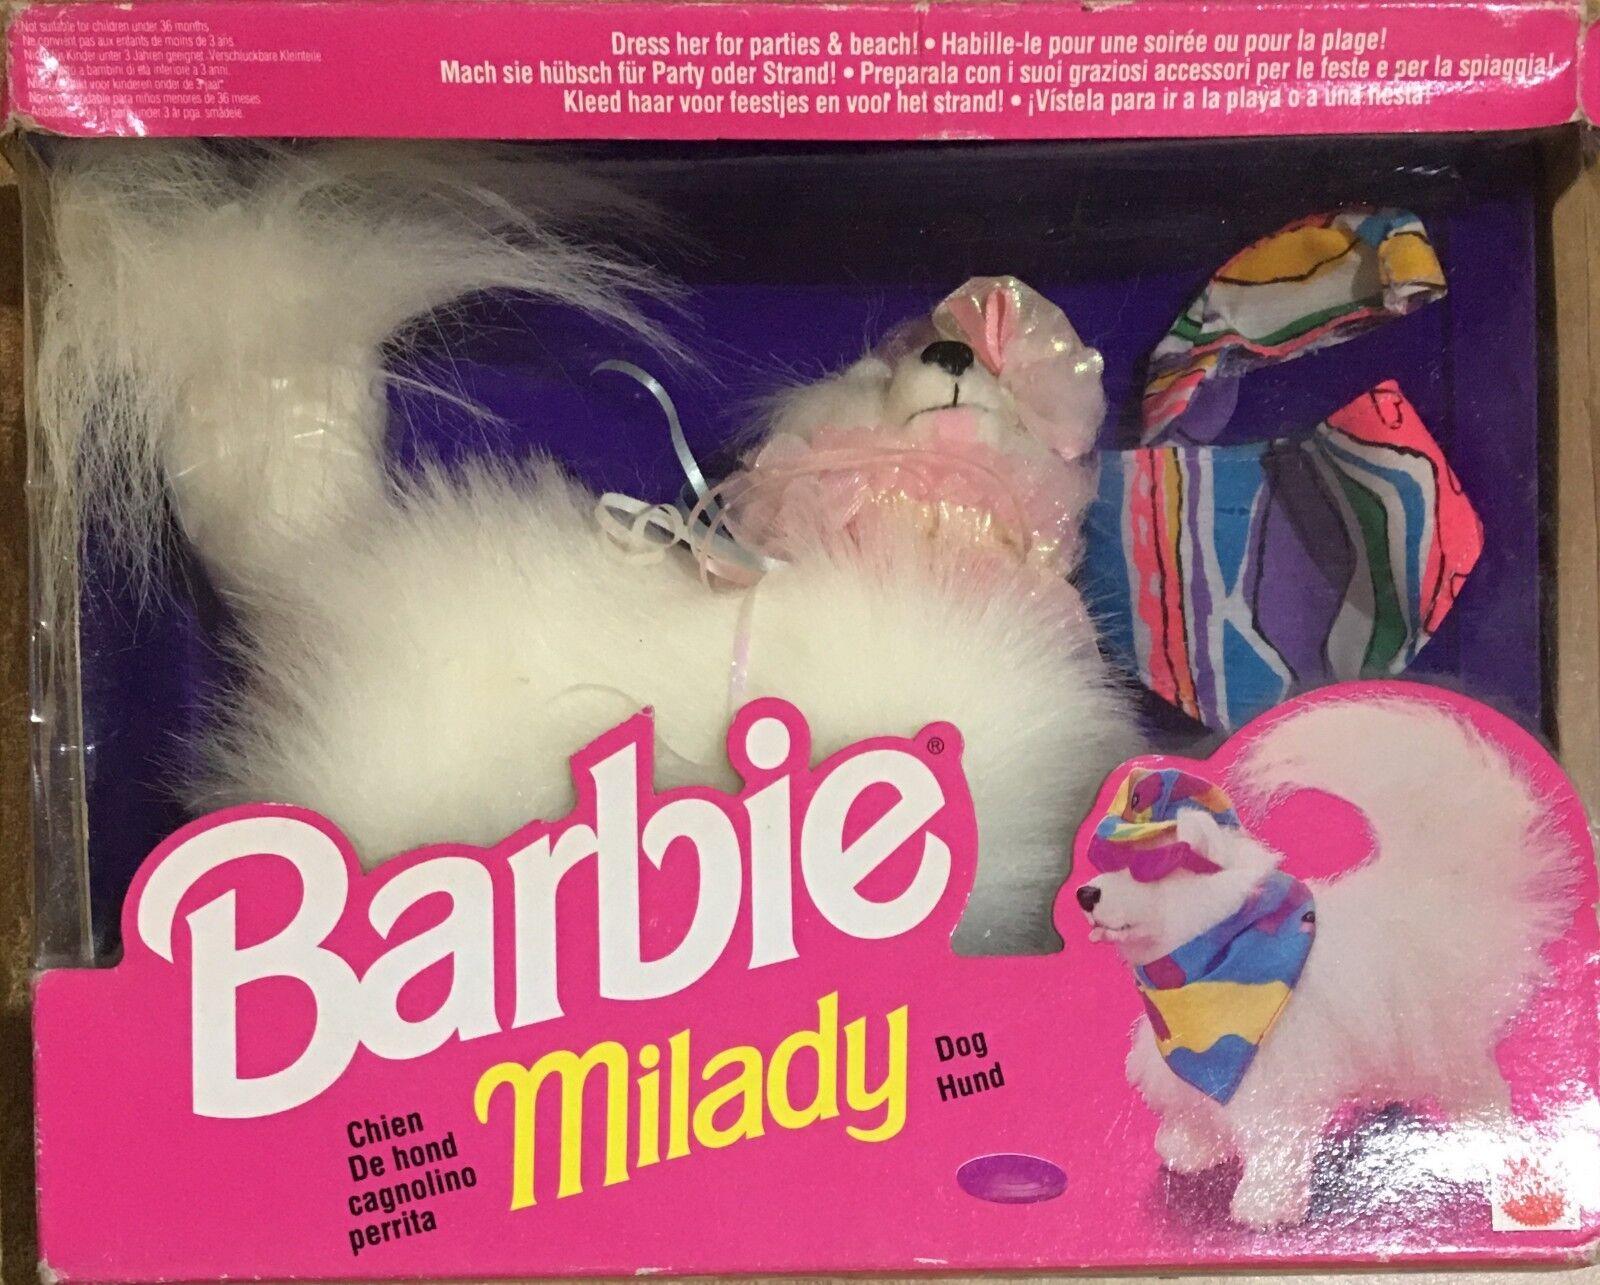 Barbie Mattel Mattel Mattel Milady Cagnolino Anno 91' 2f814a